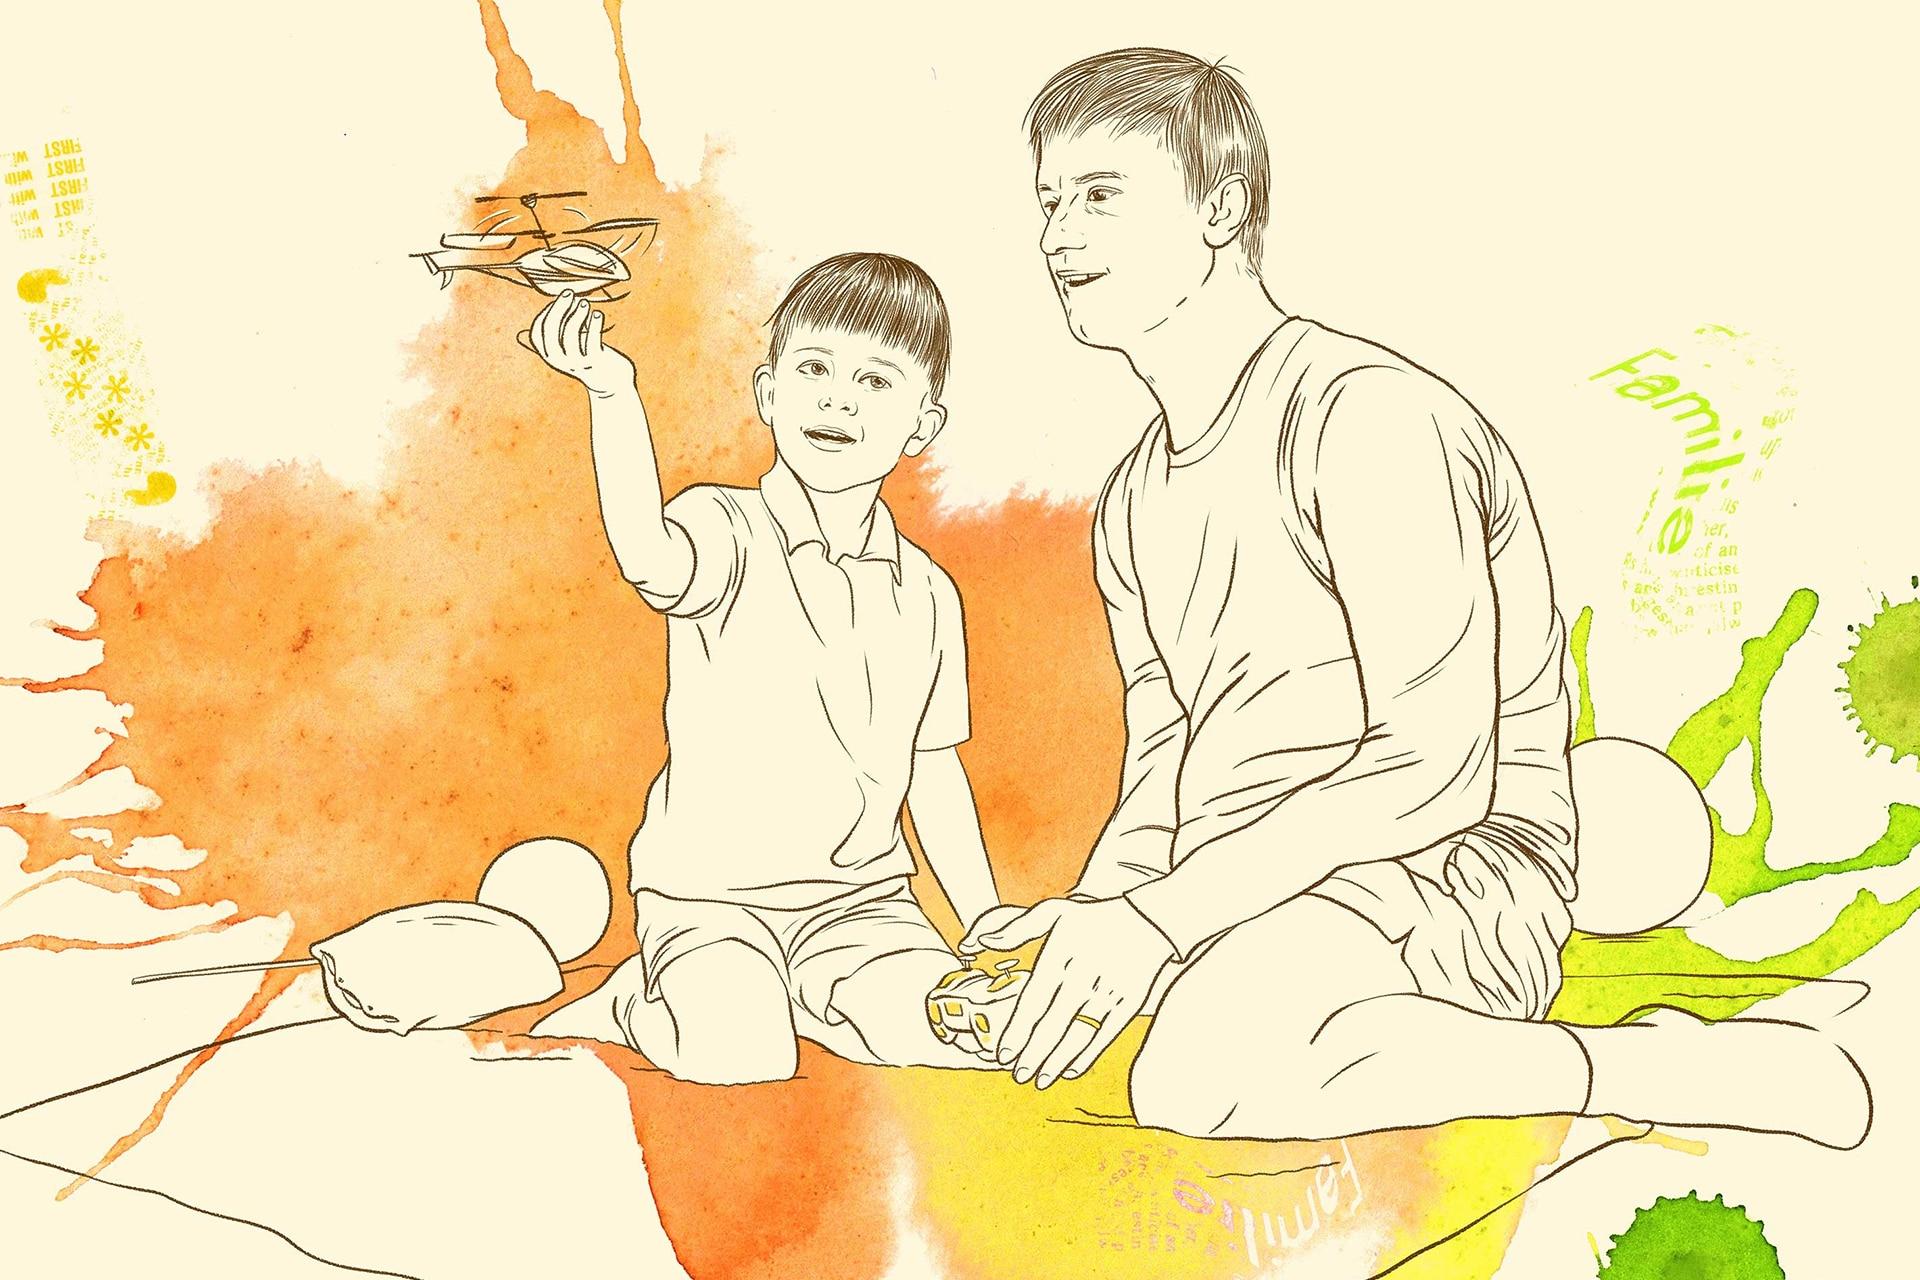 Illustration: Begleiteter Umgang